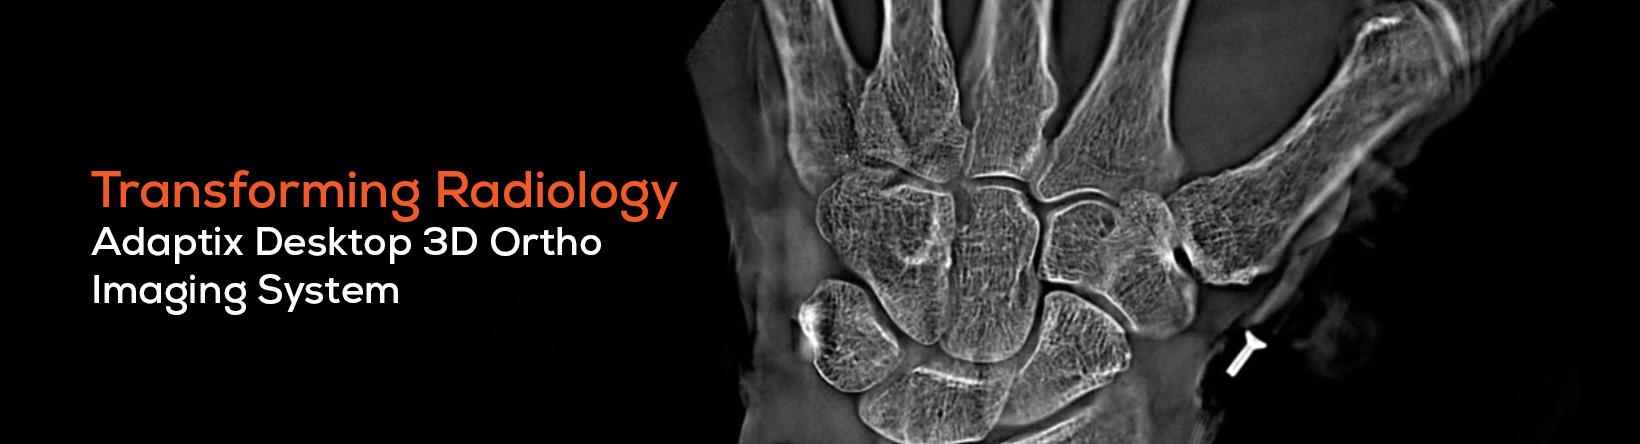 Adaptix-Orthopeadics-wrist-large-image-wide-02-messaging